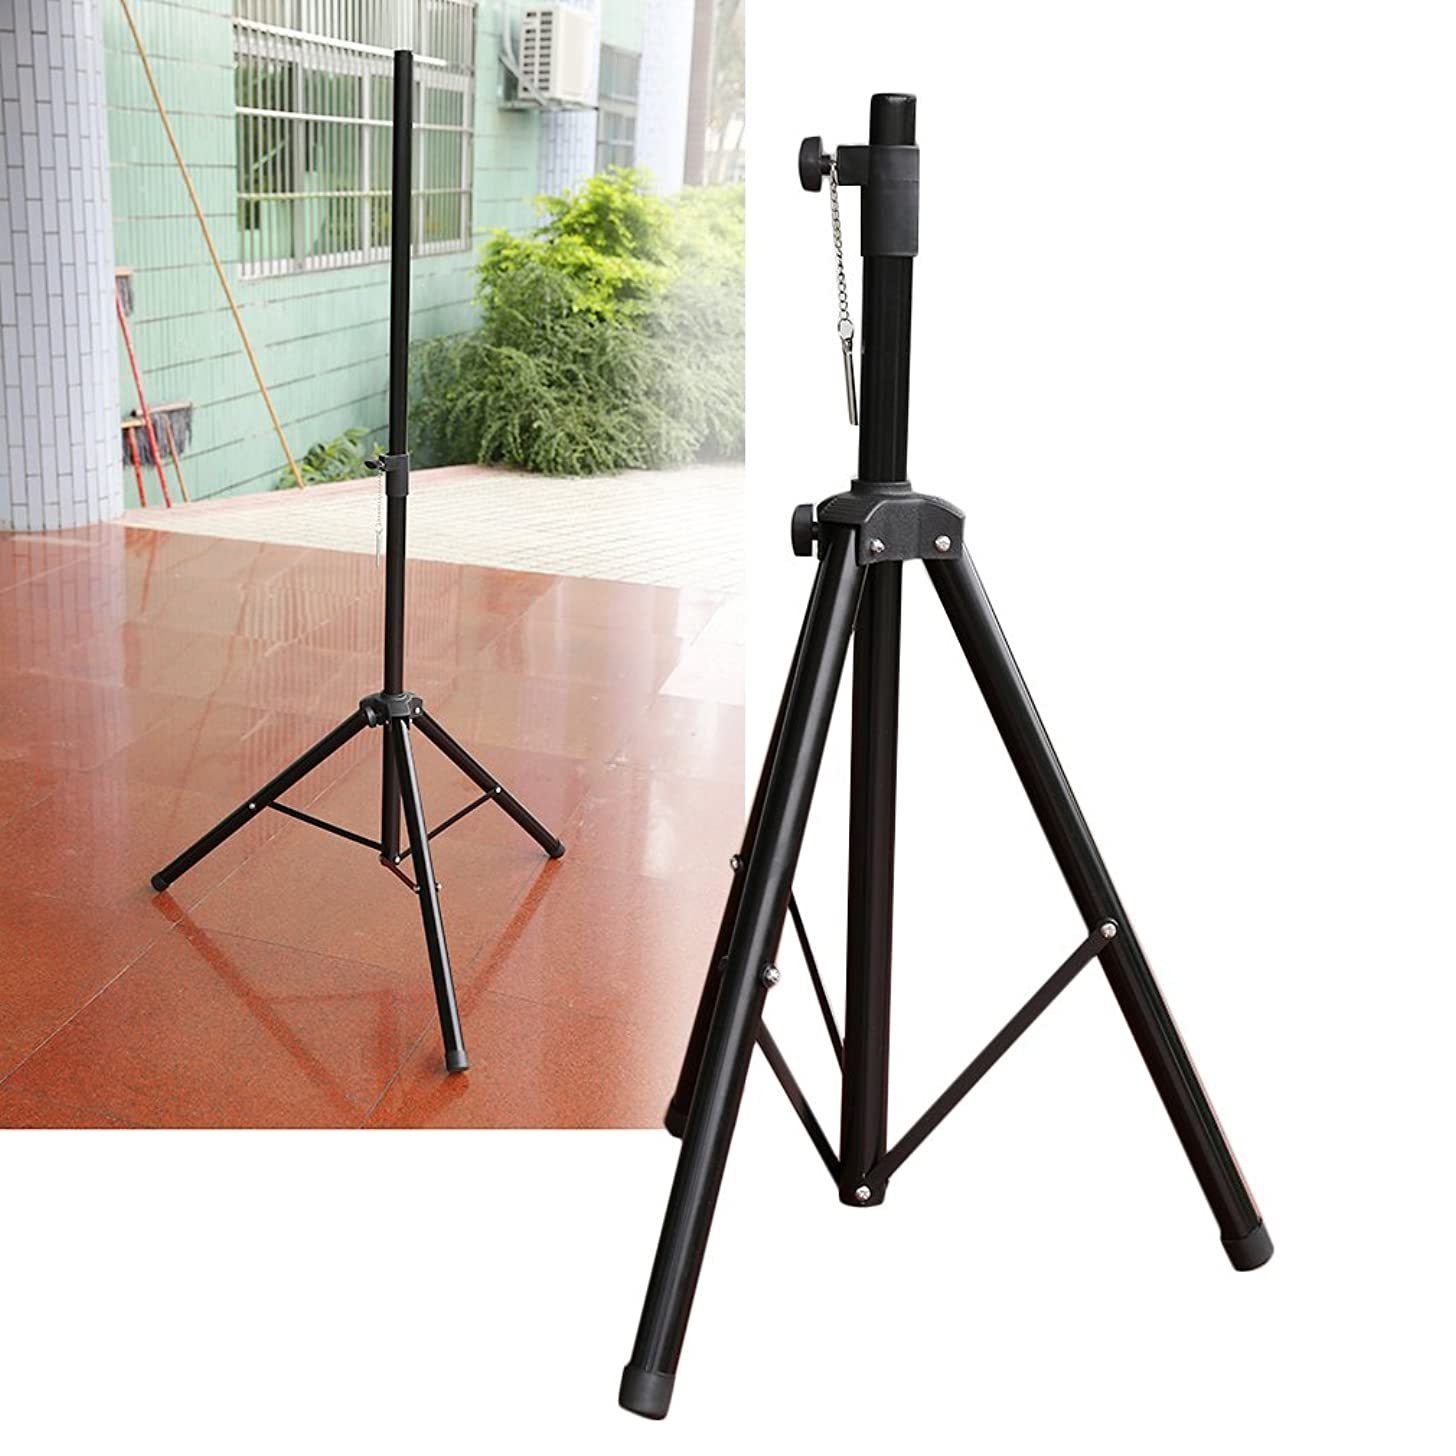 Coldcedar Heavy Duty Speaker Stands Pair Pro Adjustable Height Tripod Speaker stands Pole-Mount DJ PA Speaker Stand (Pack of 2)